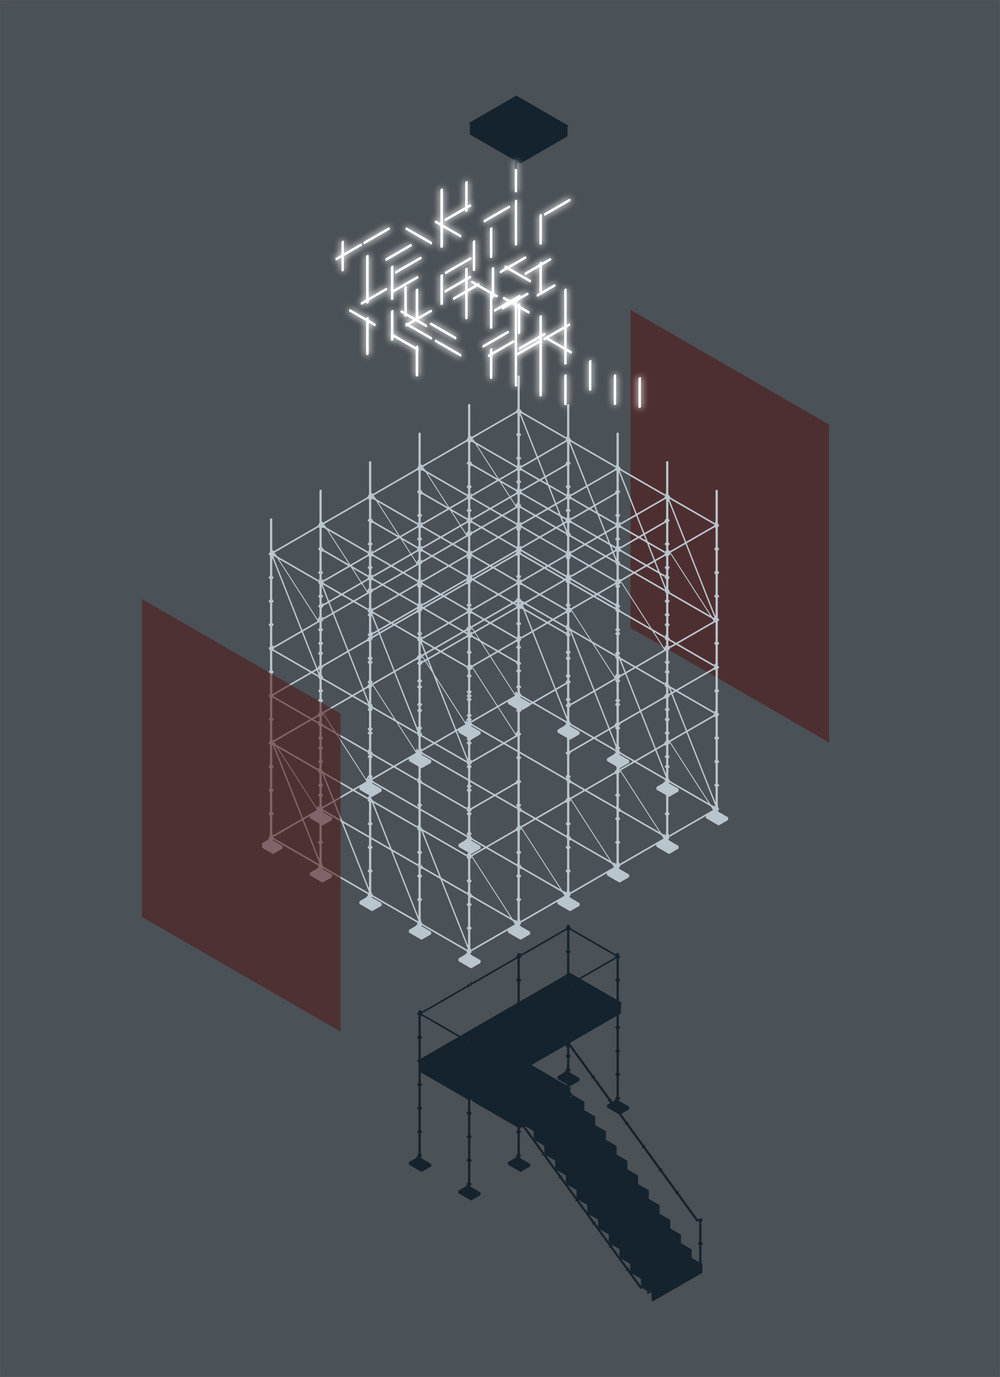 Dreamer_Architecture_Amsterdam_Installation_Amsterdamlight_Cumulonimbus02.jpg